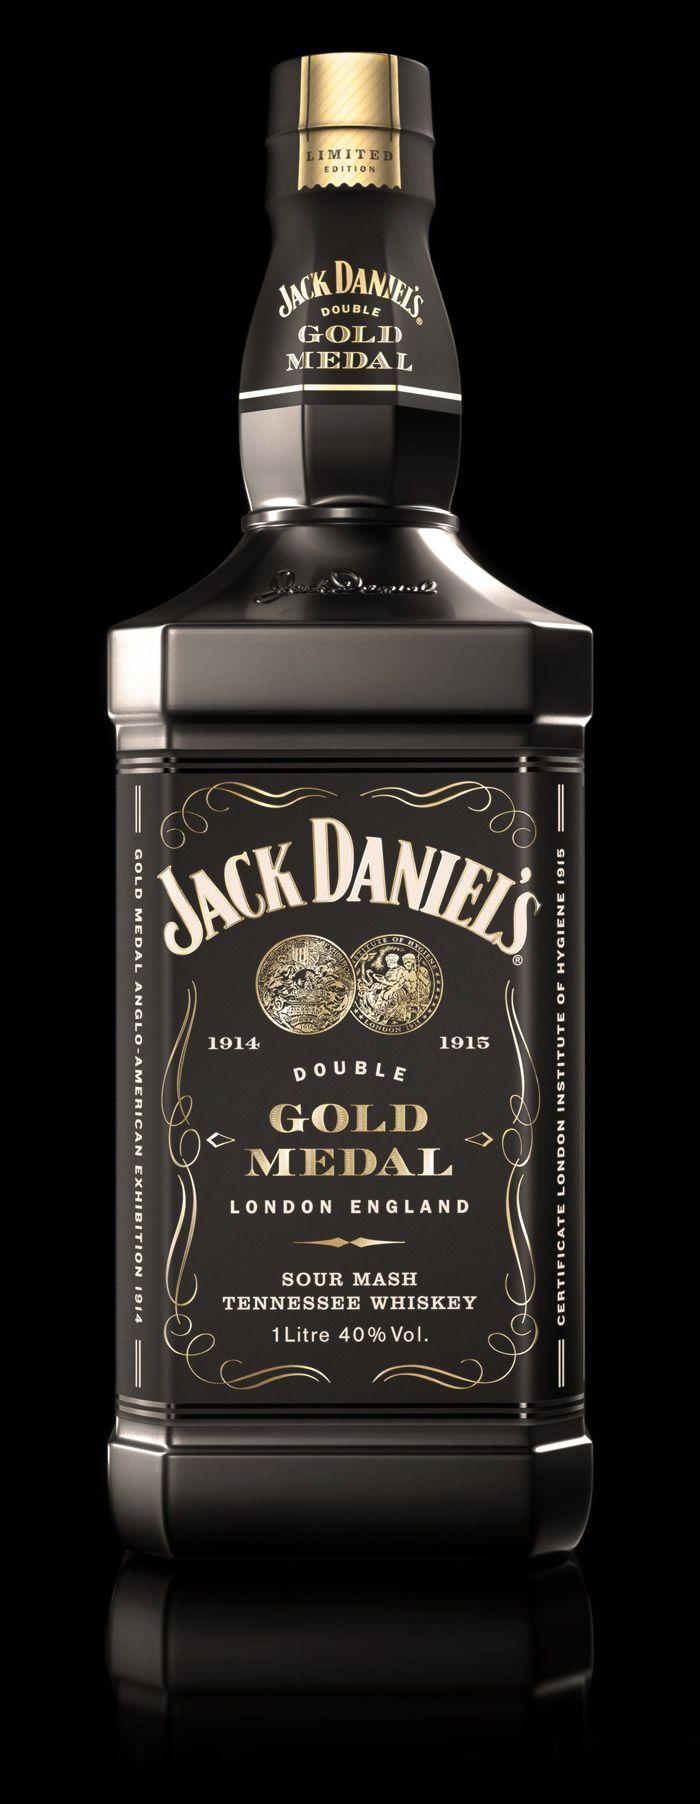 "ltd edition jack daniels  www.LiquorList.com  ""The Marketplace for Adults with Taste"" @LiquorListcom   #LiquorList"